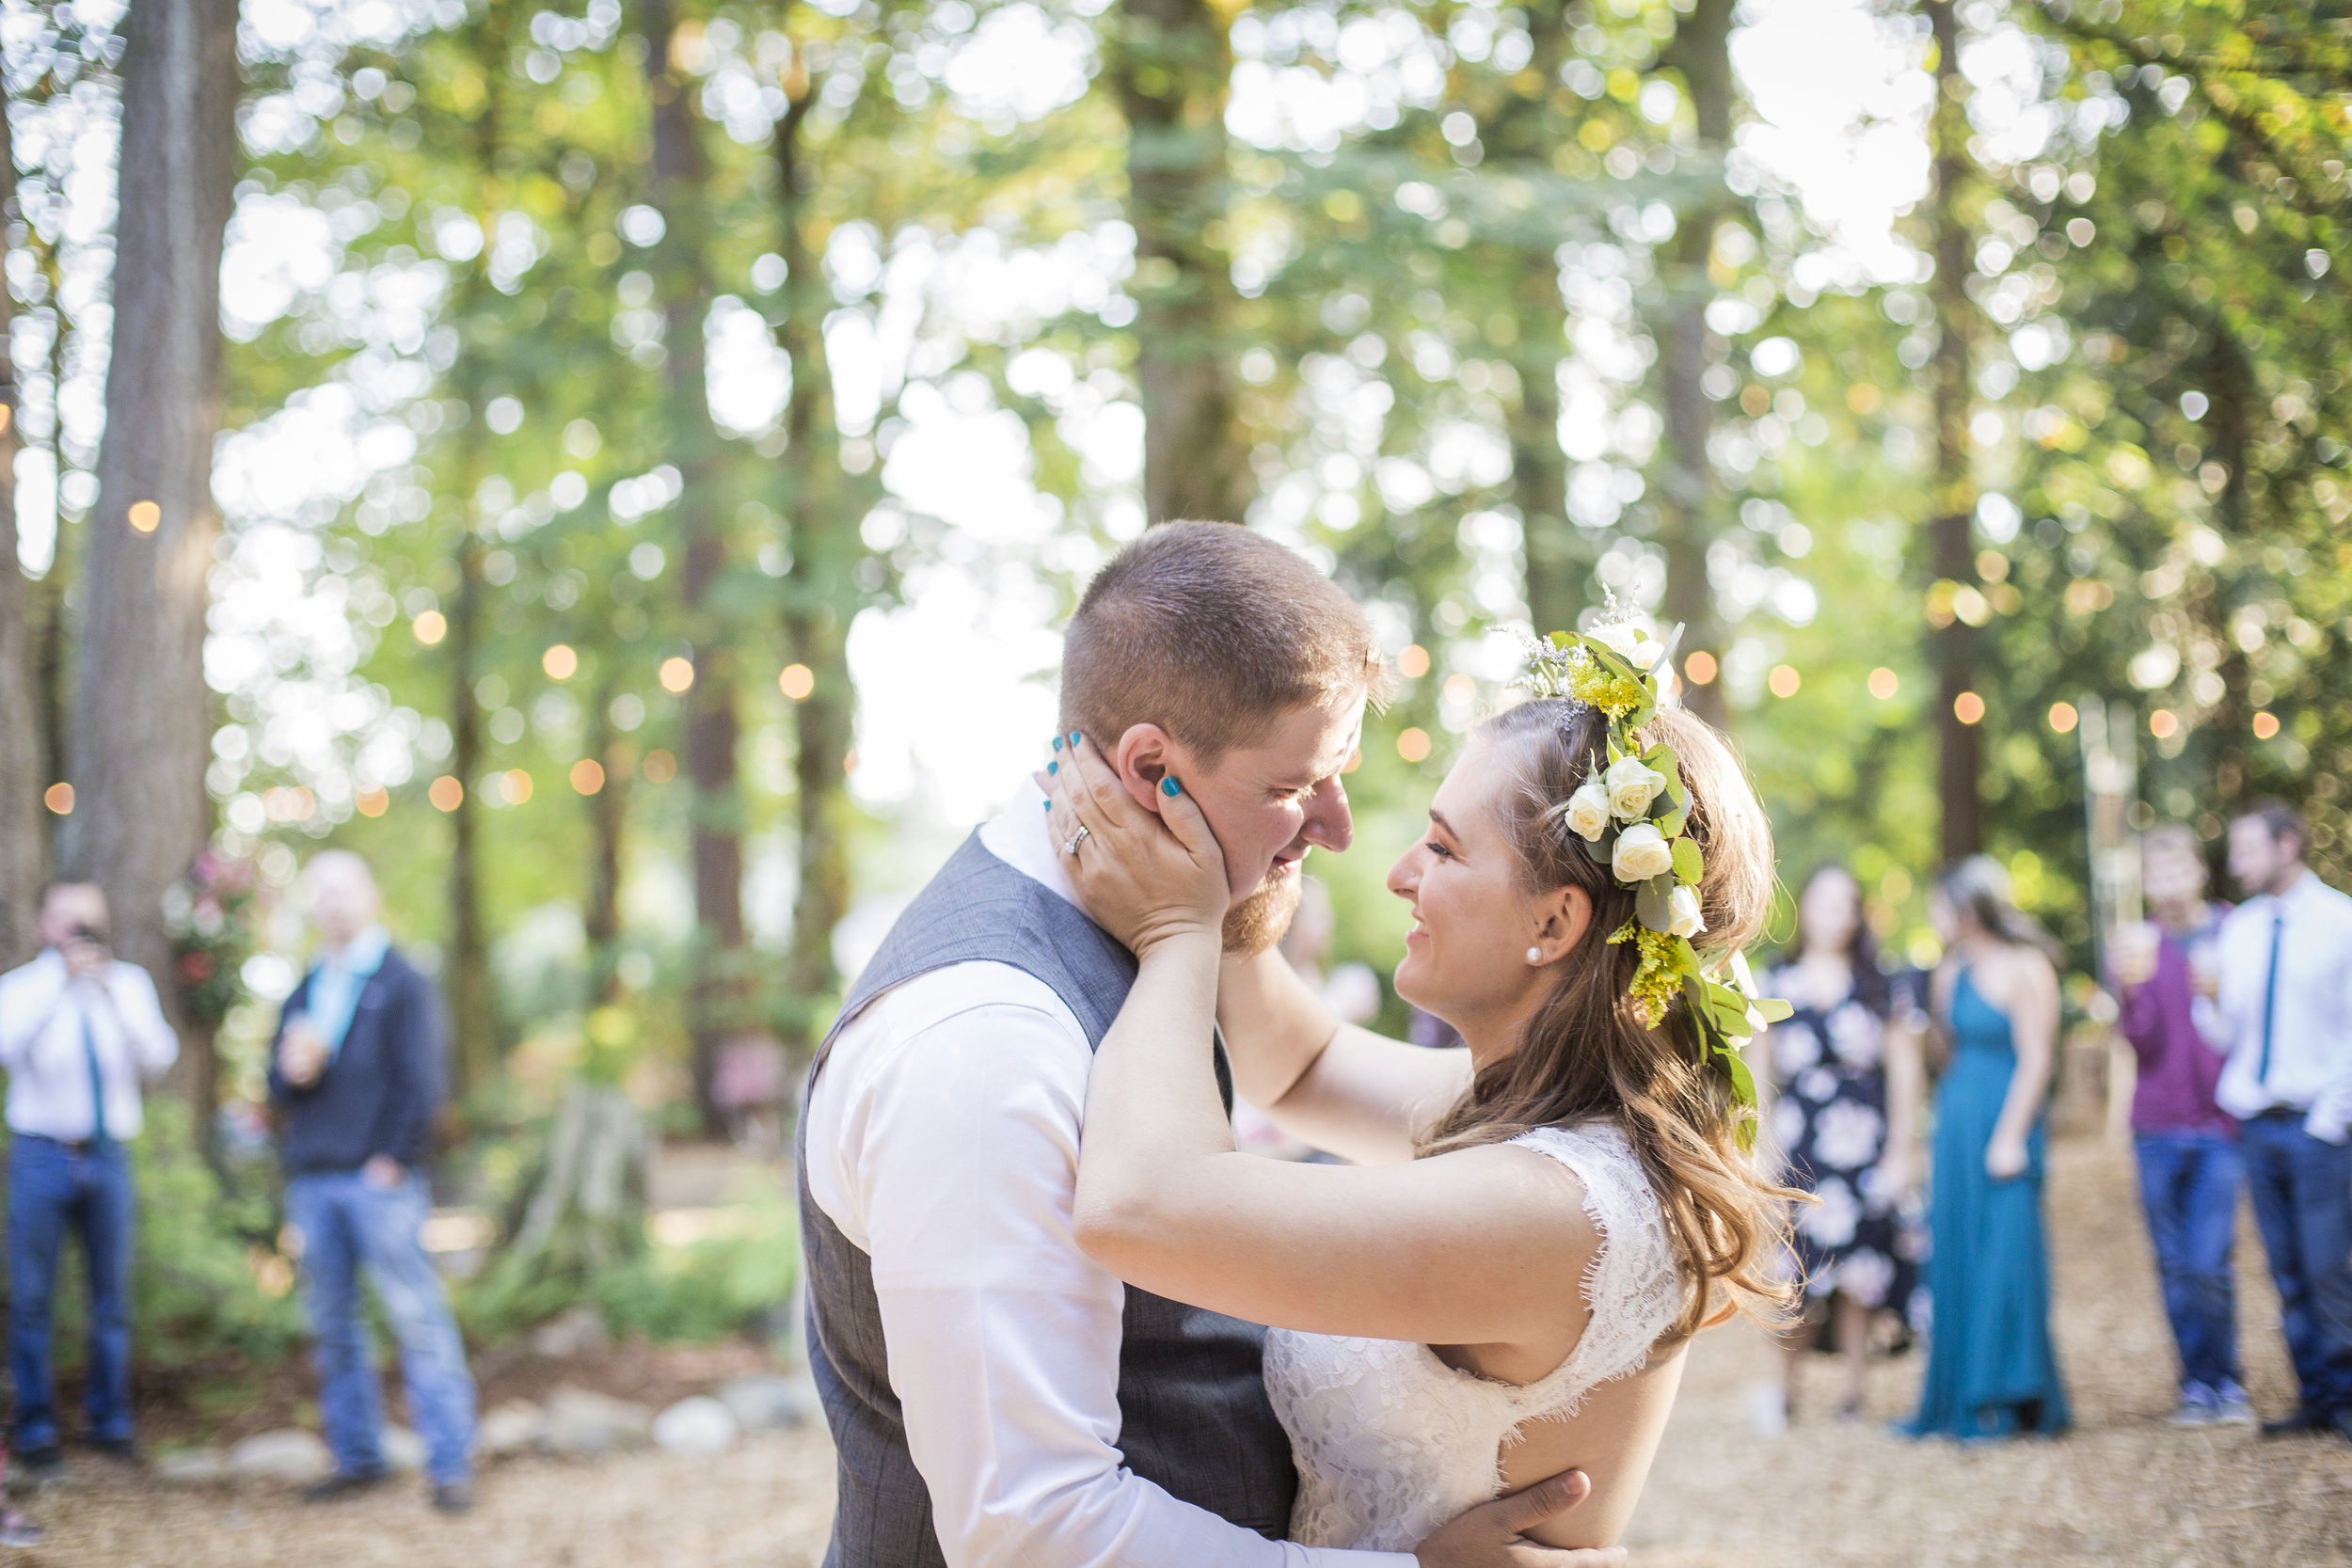 Seattle-Tacoma-Wedding-Photographer-Jaeda-Reed-Fall-Glenwood-Tree-Farm-15.jpg